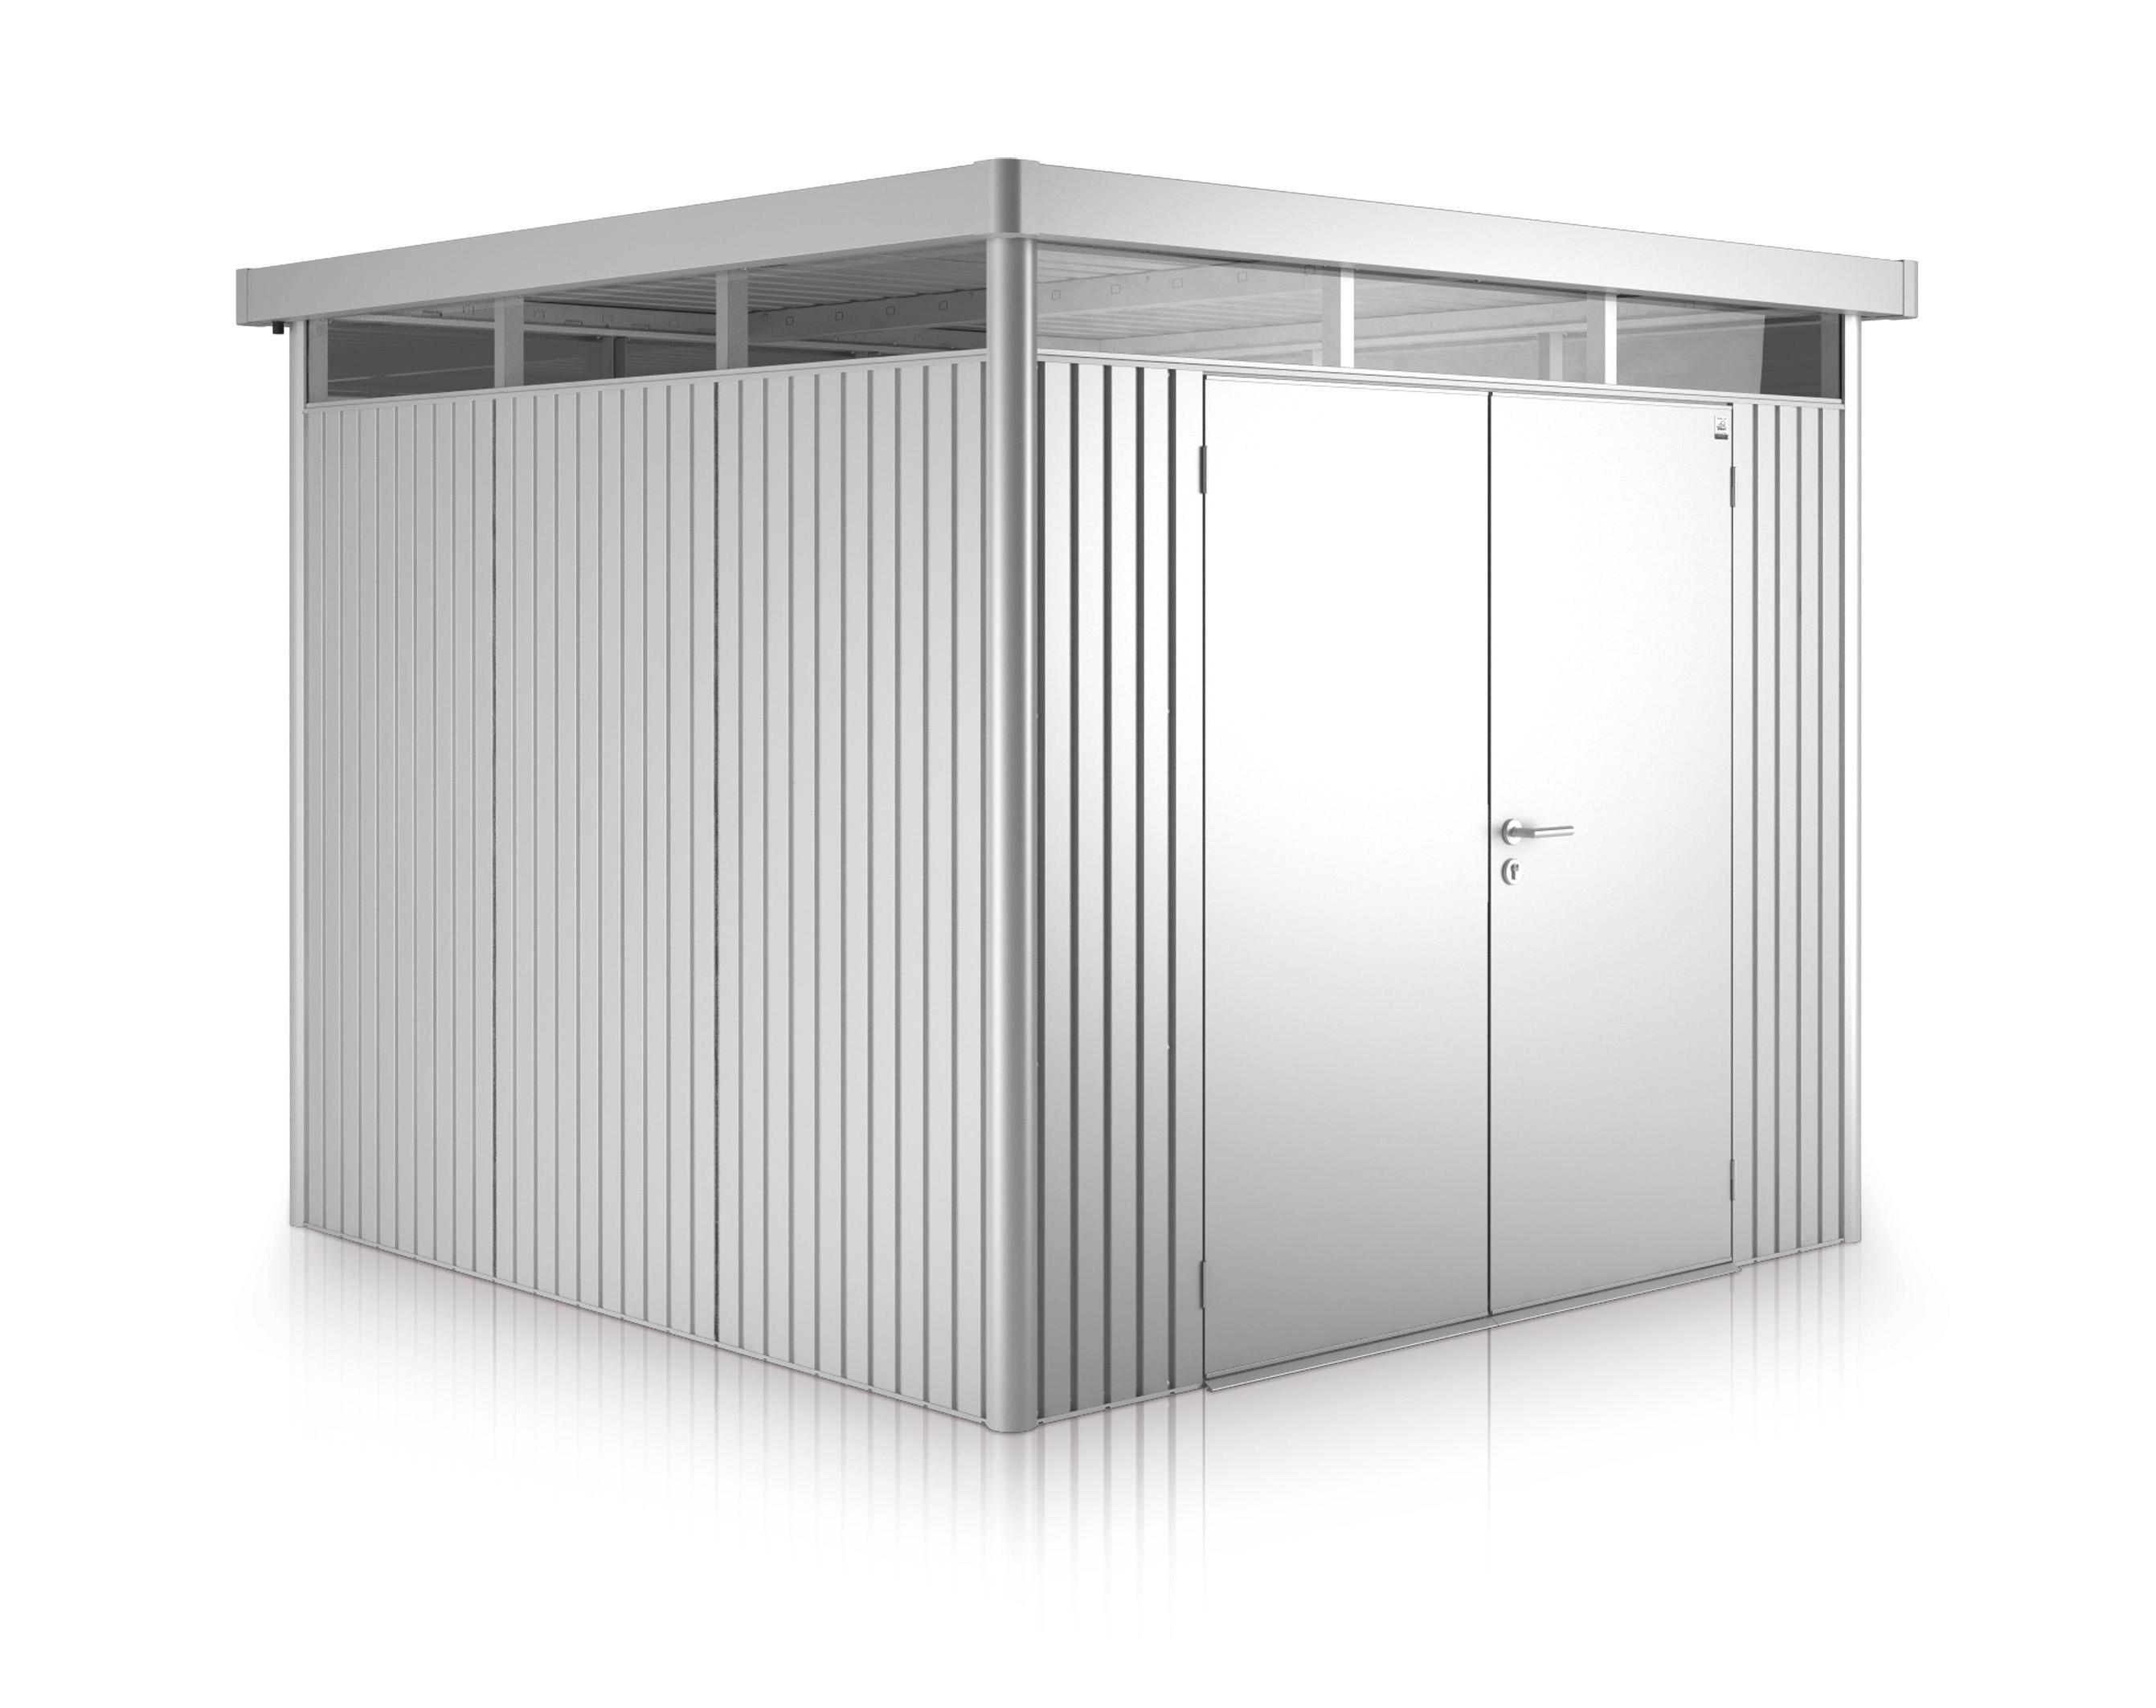 Gerätehaus Biohort HighLine H2 silber-metallic DT 275x195cm Bild 1